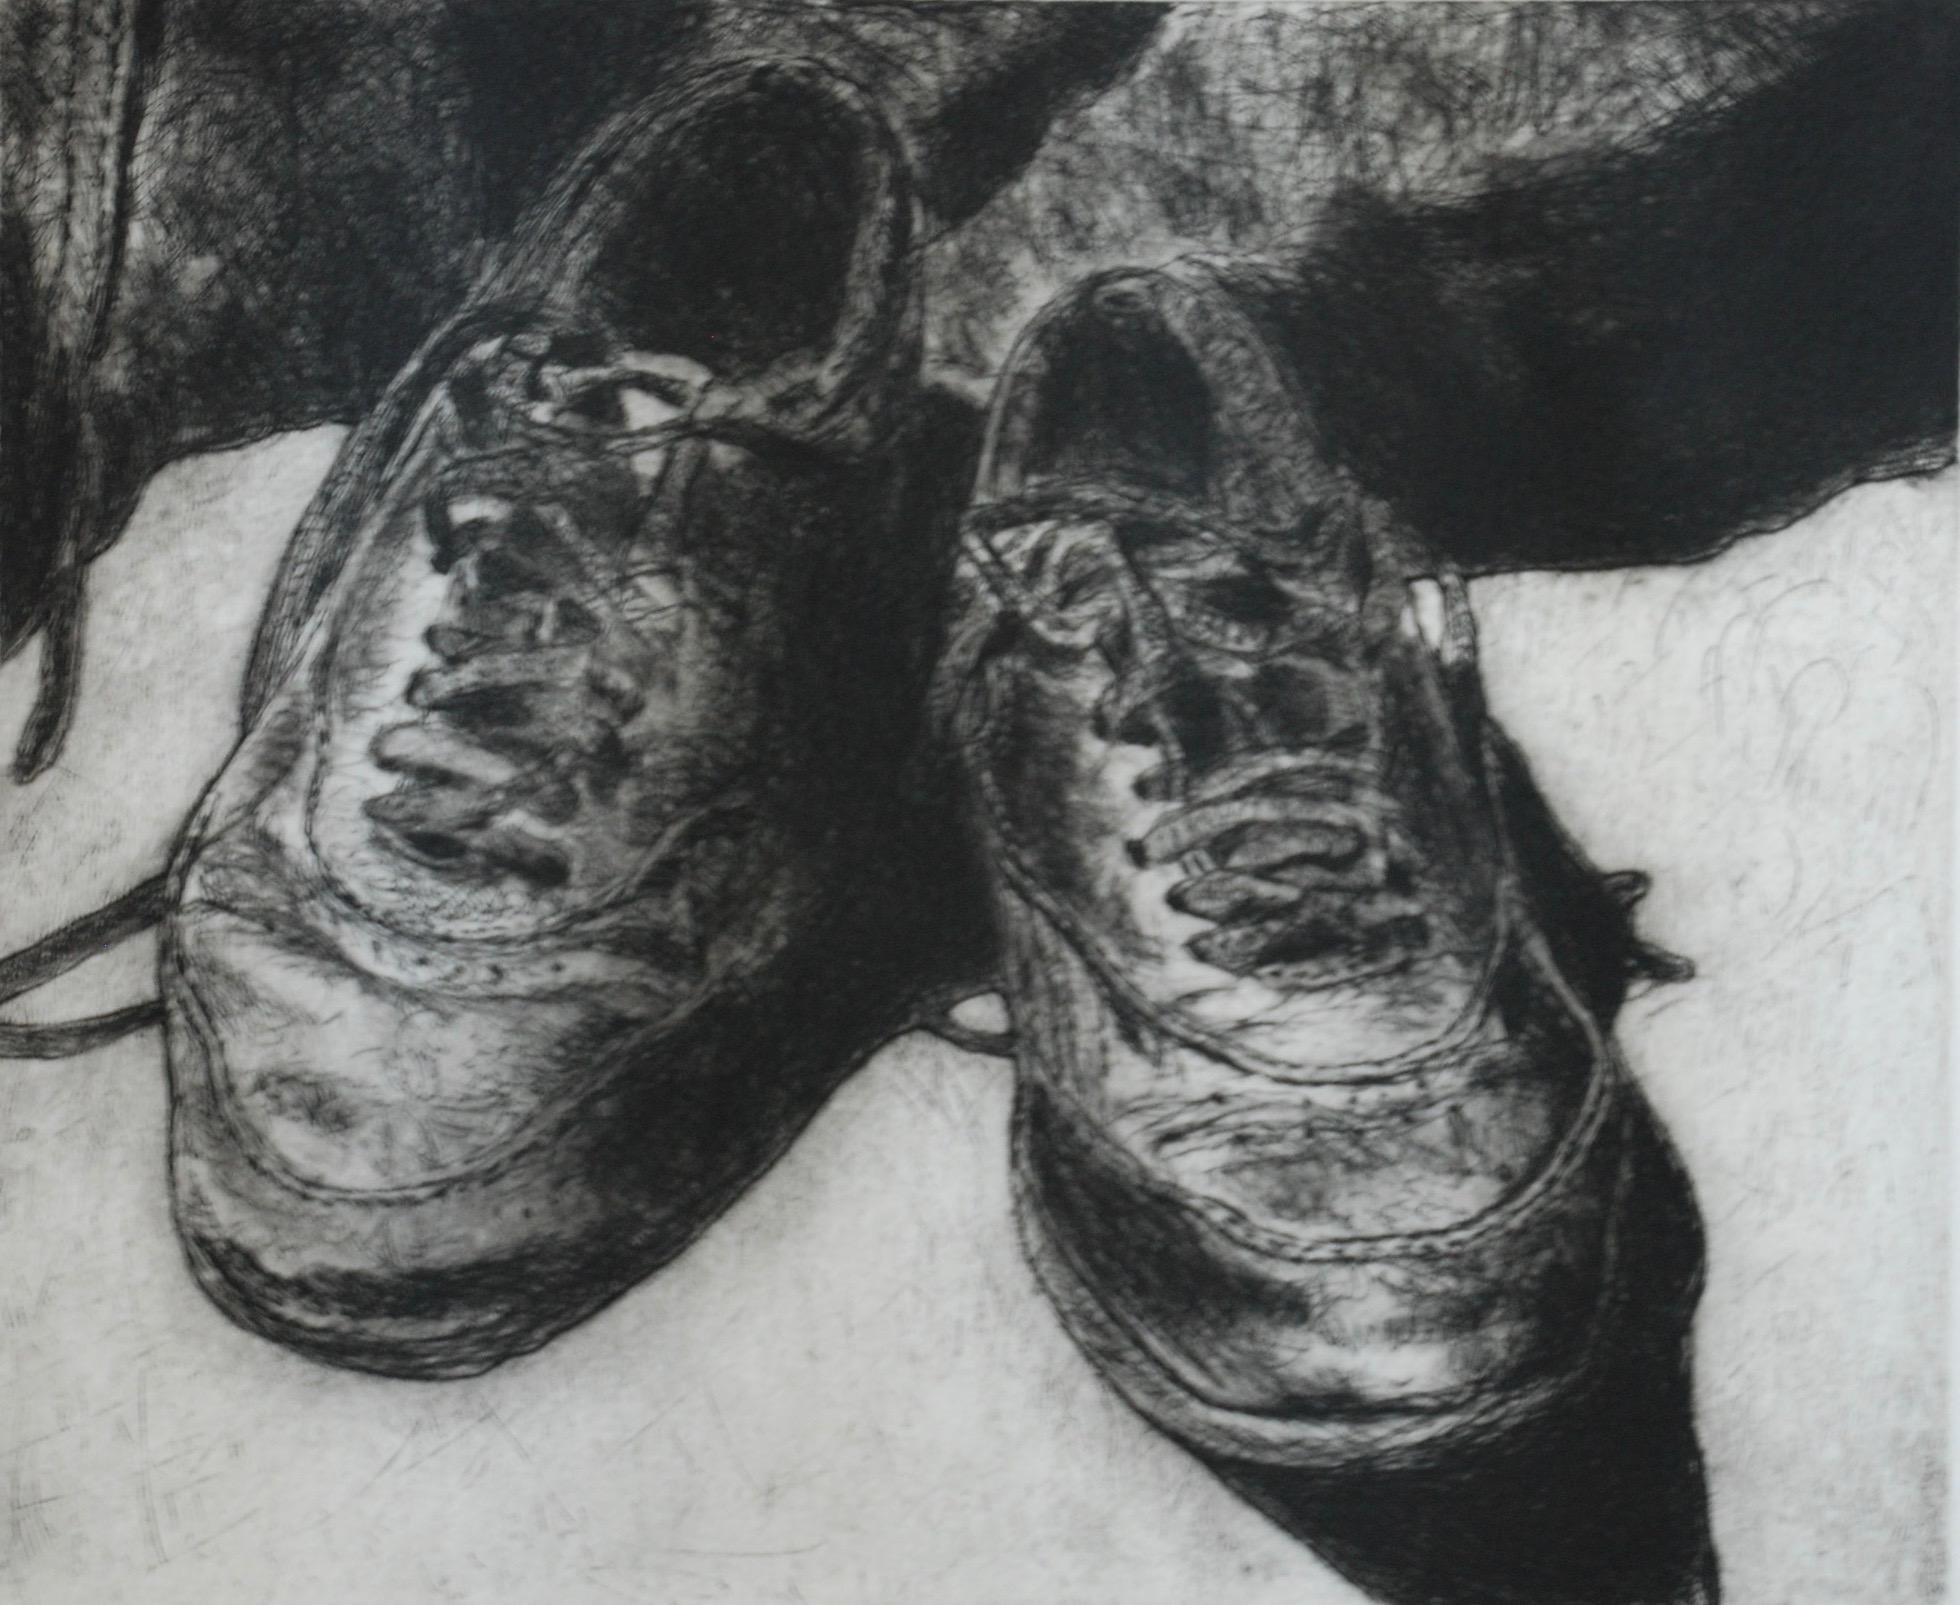 Gordon Applebe Smith, Self Portrait, 2000